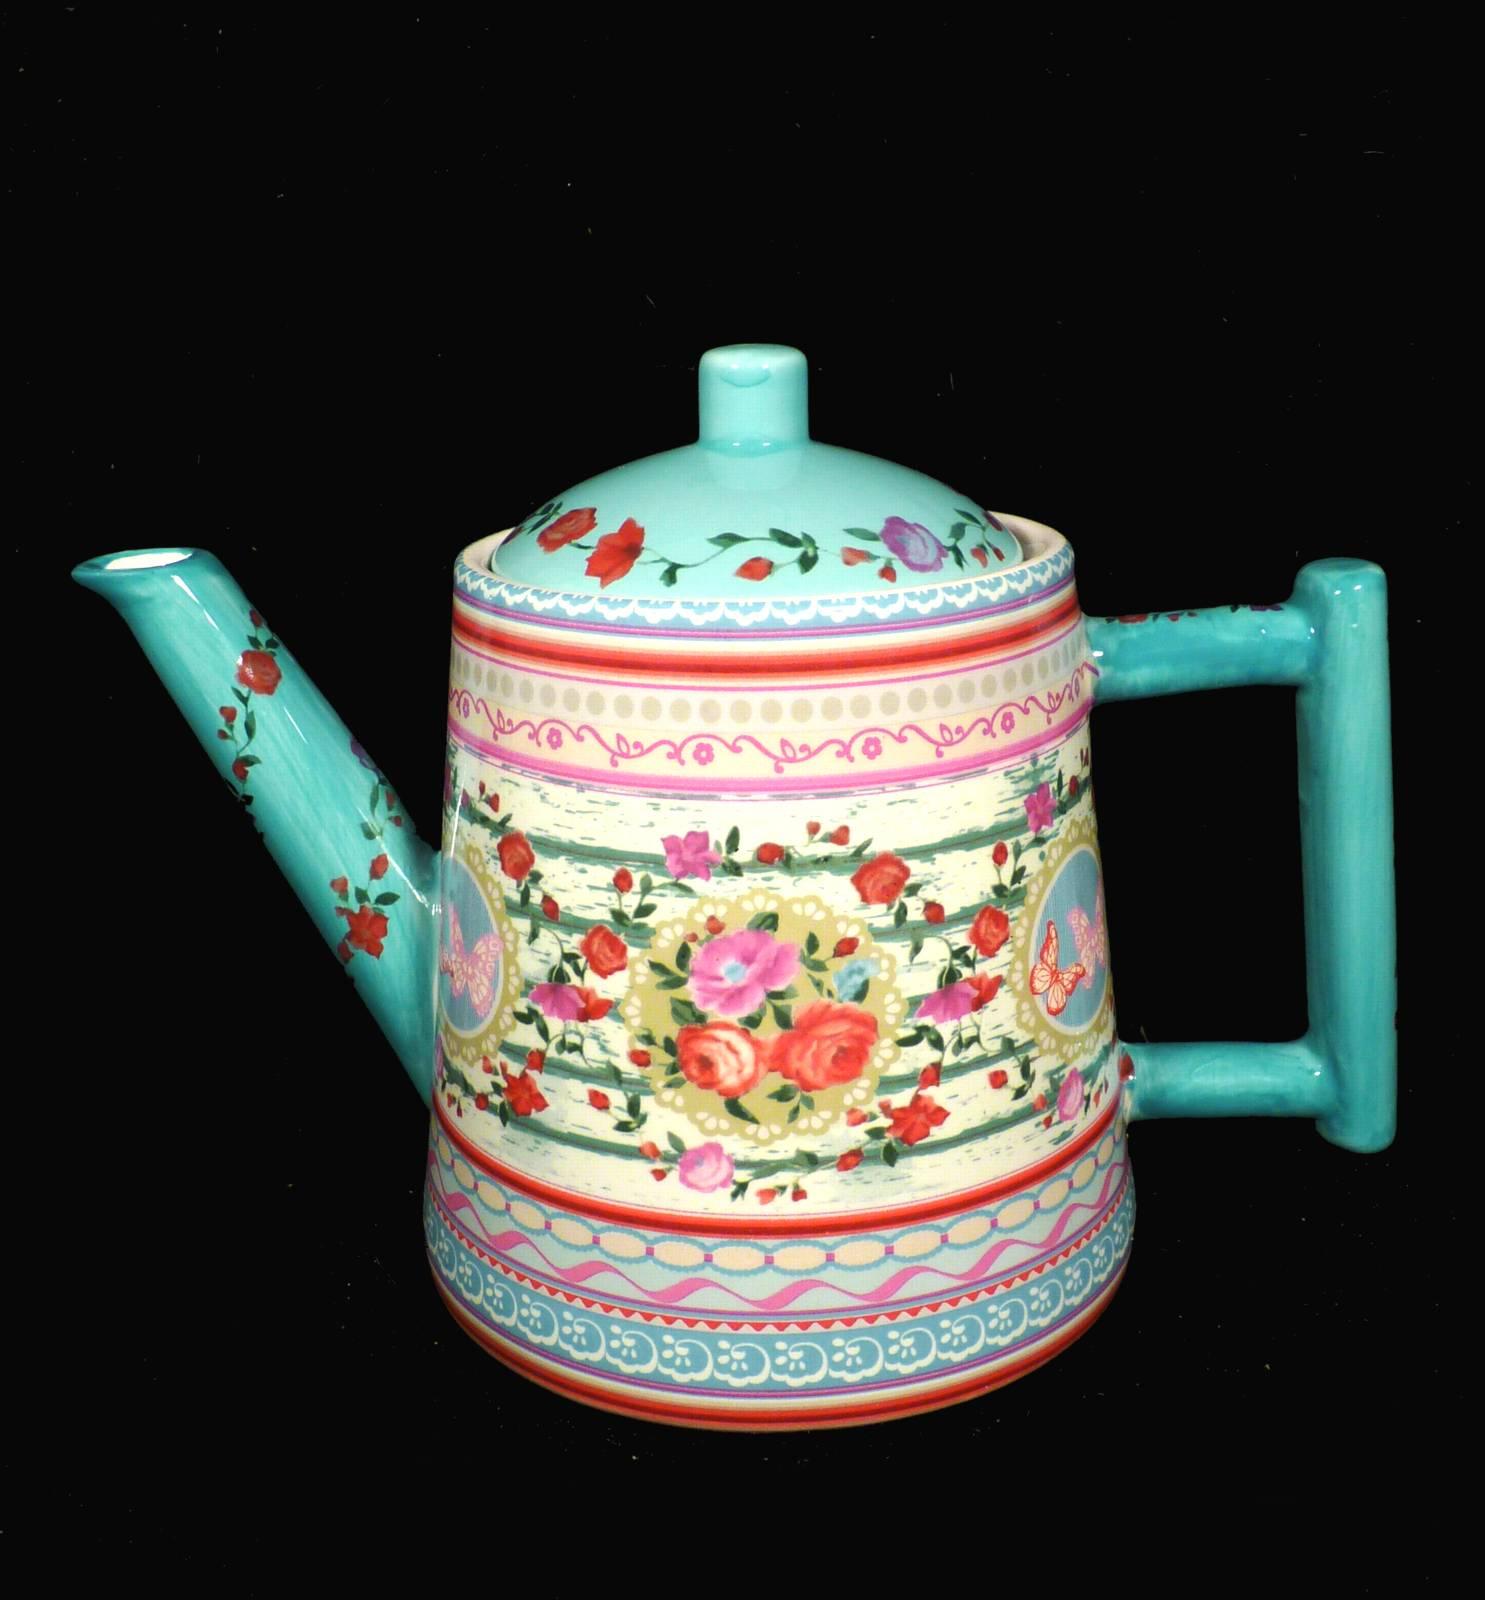 kaffeekanne teekanne kanne jameson tailor keramik design nostalgie 2 wahl ebay. Black Bedroom Furniture Sets. Home Design Ideas